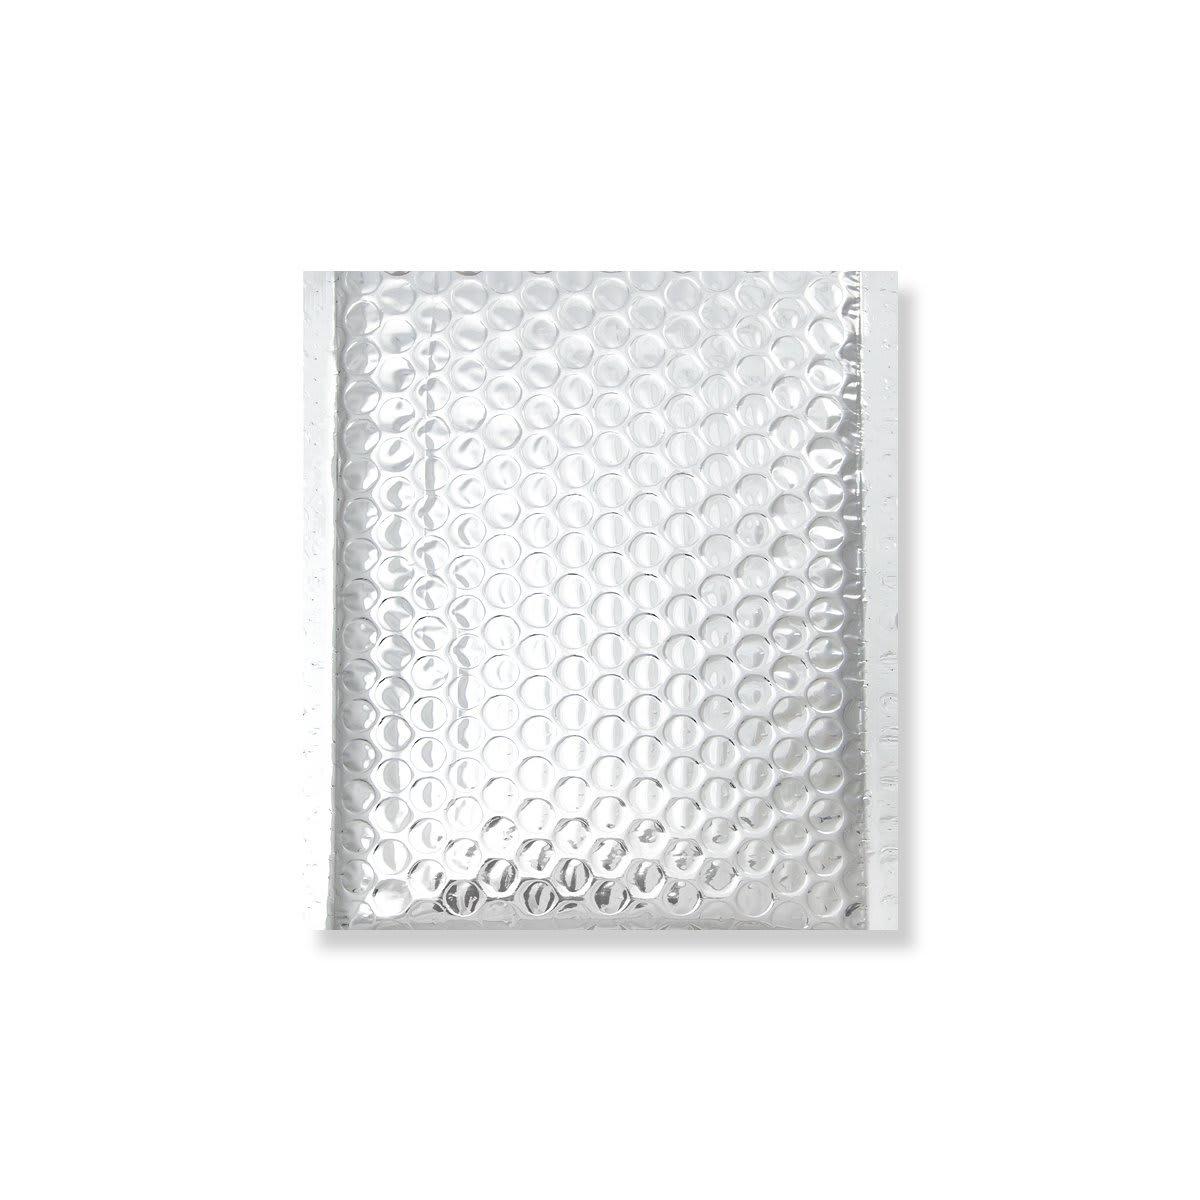 180x140mm SILVER METALLIC GLOSS BUBBLE BAGS